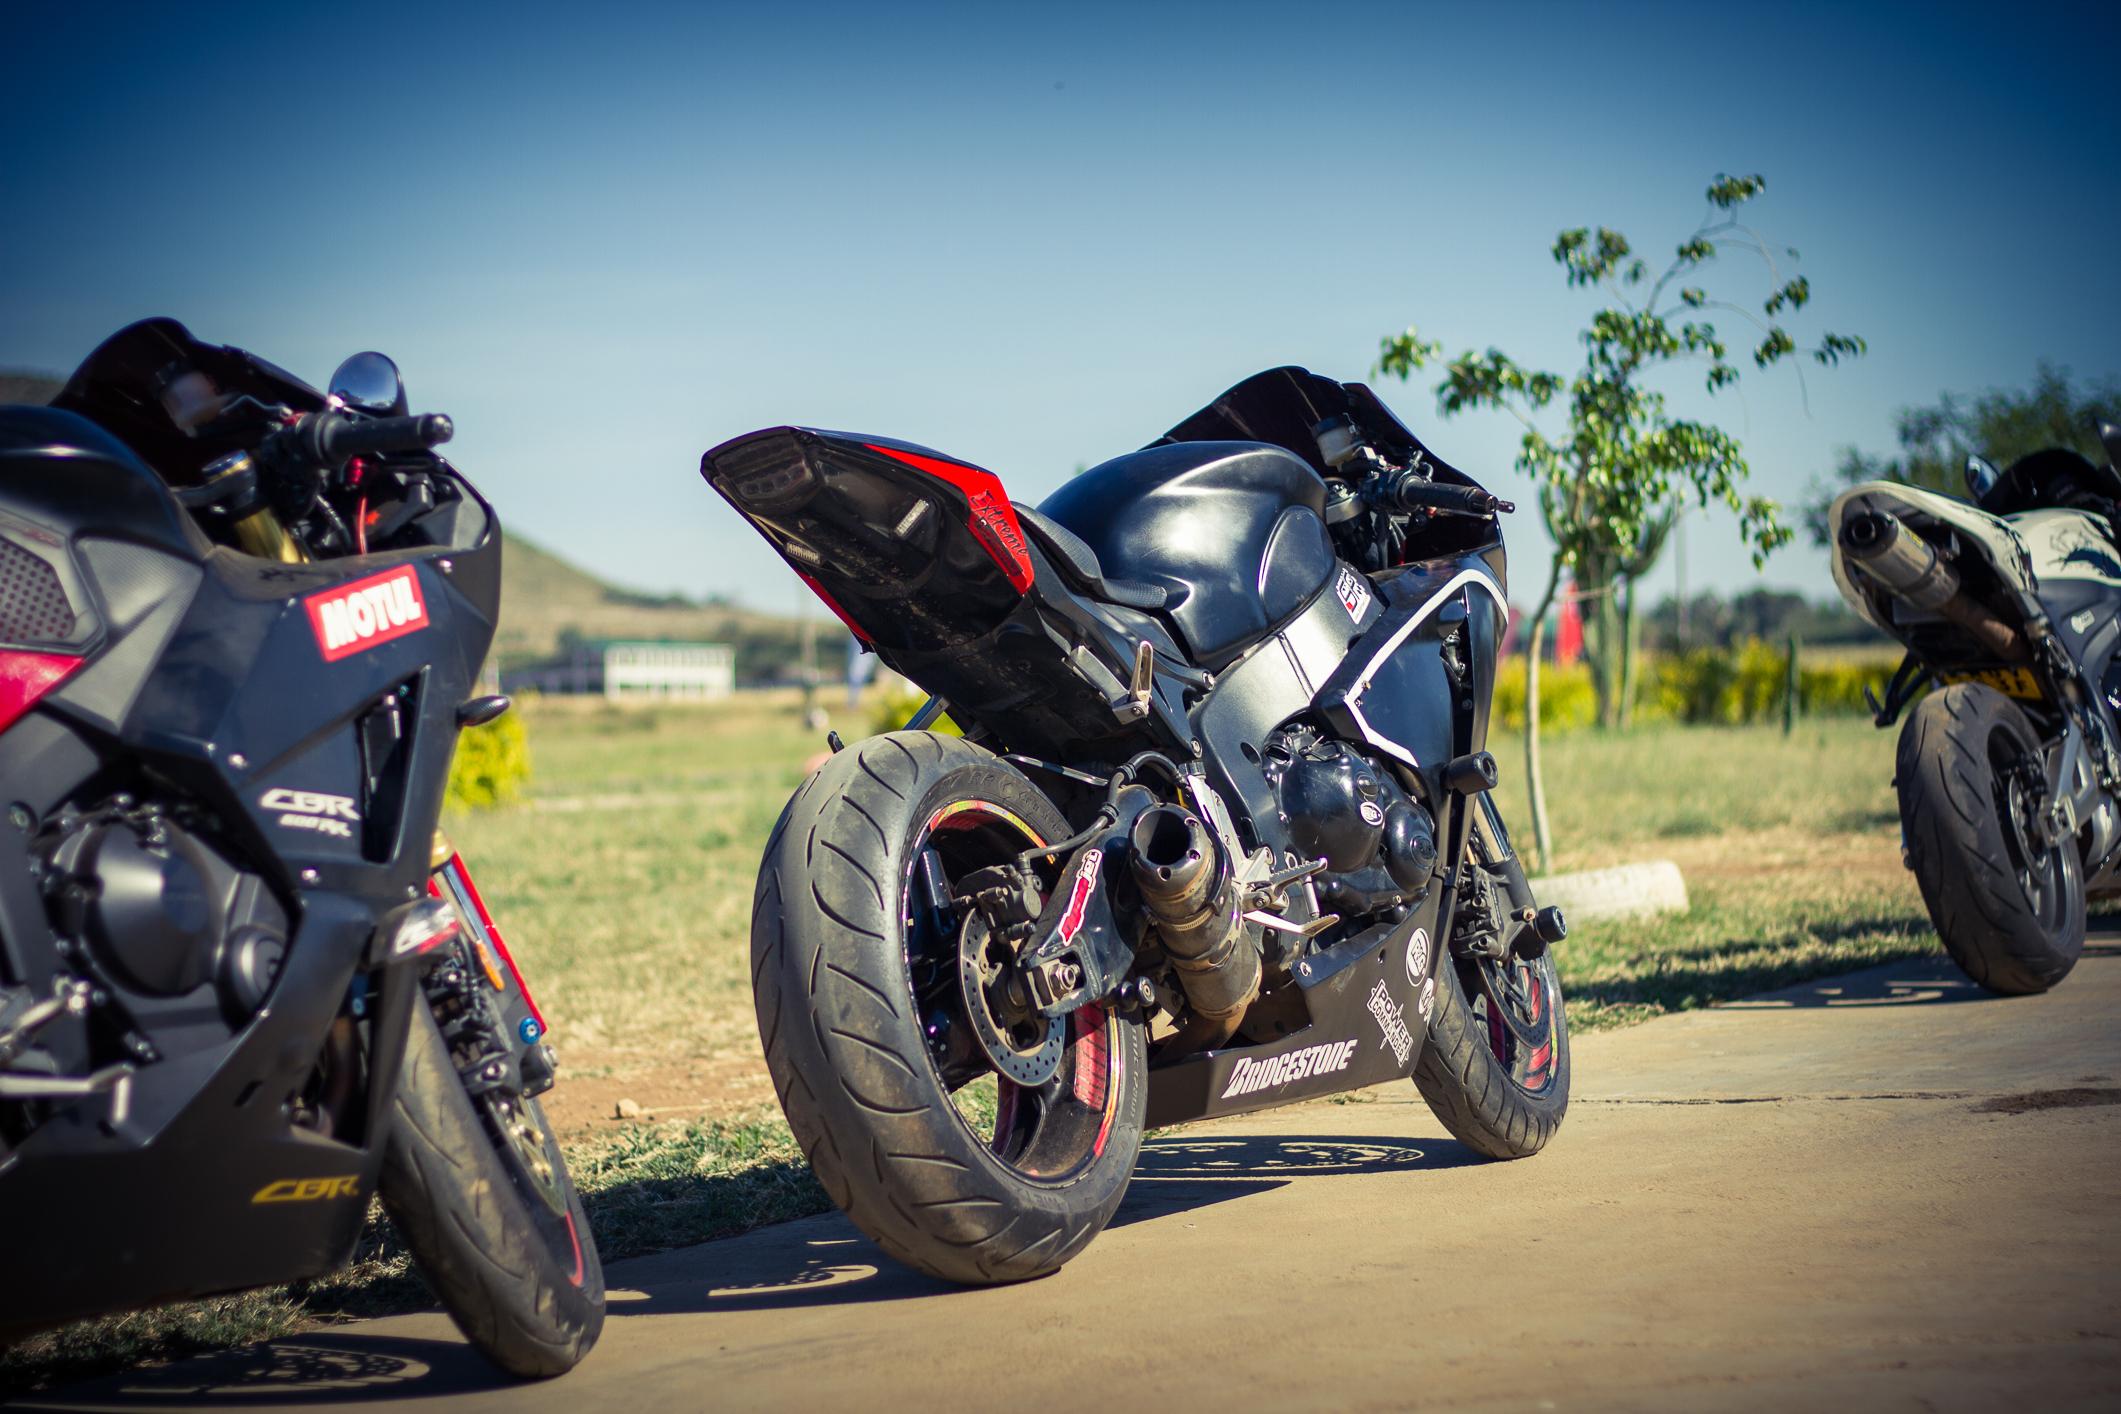 Bikes-1-10.jpg